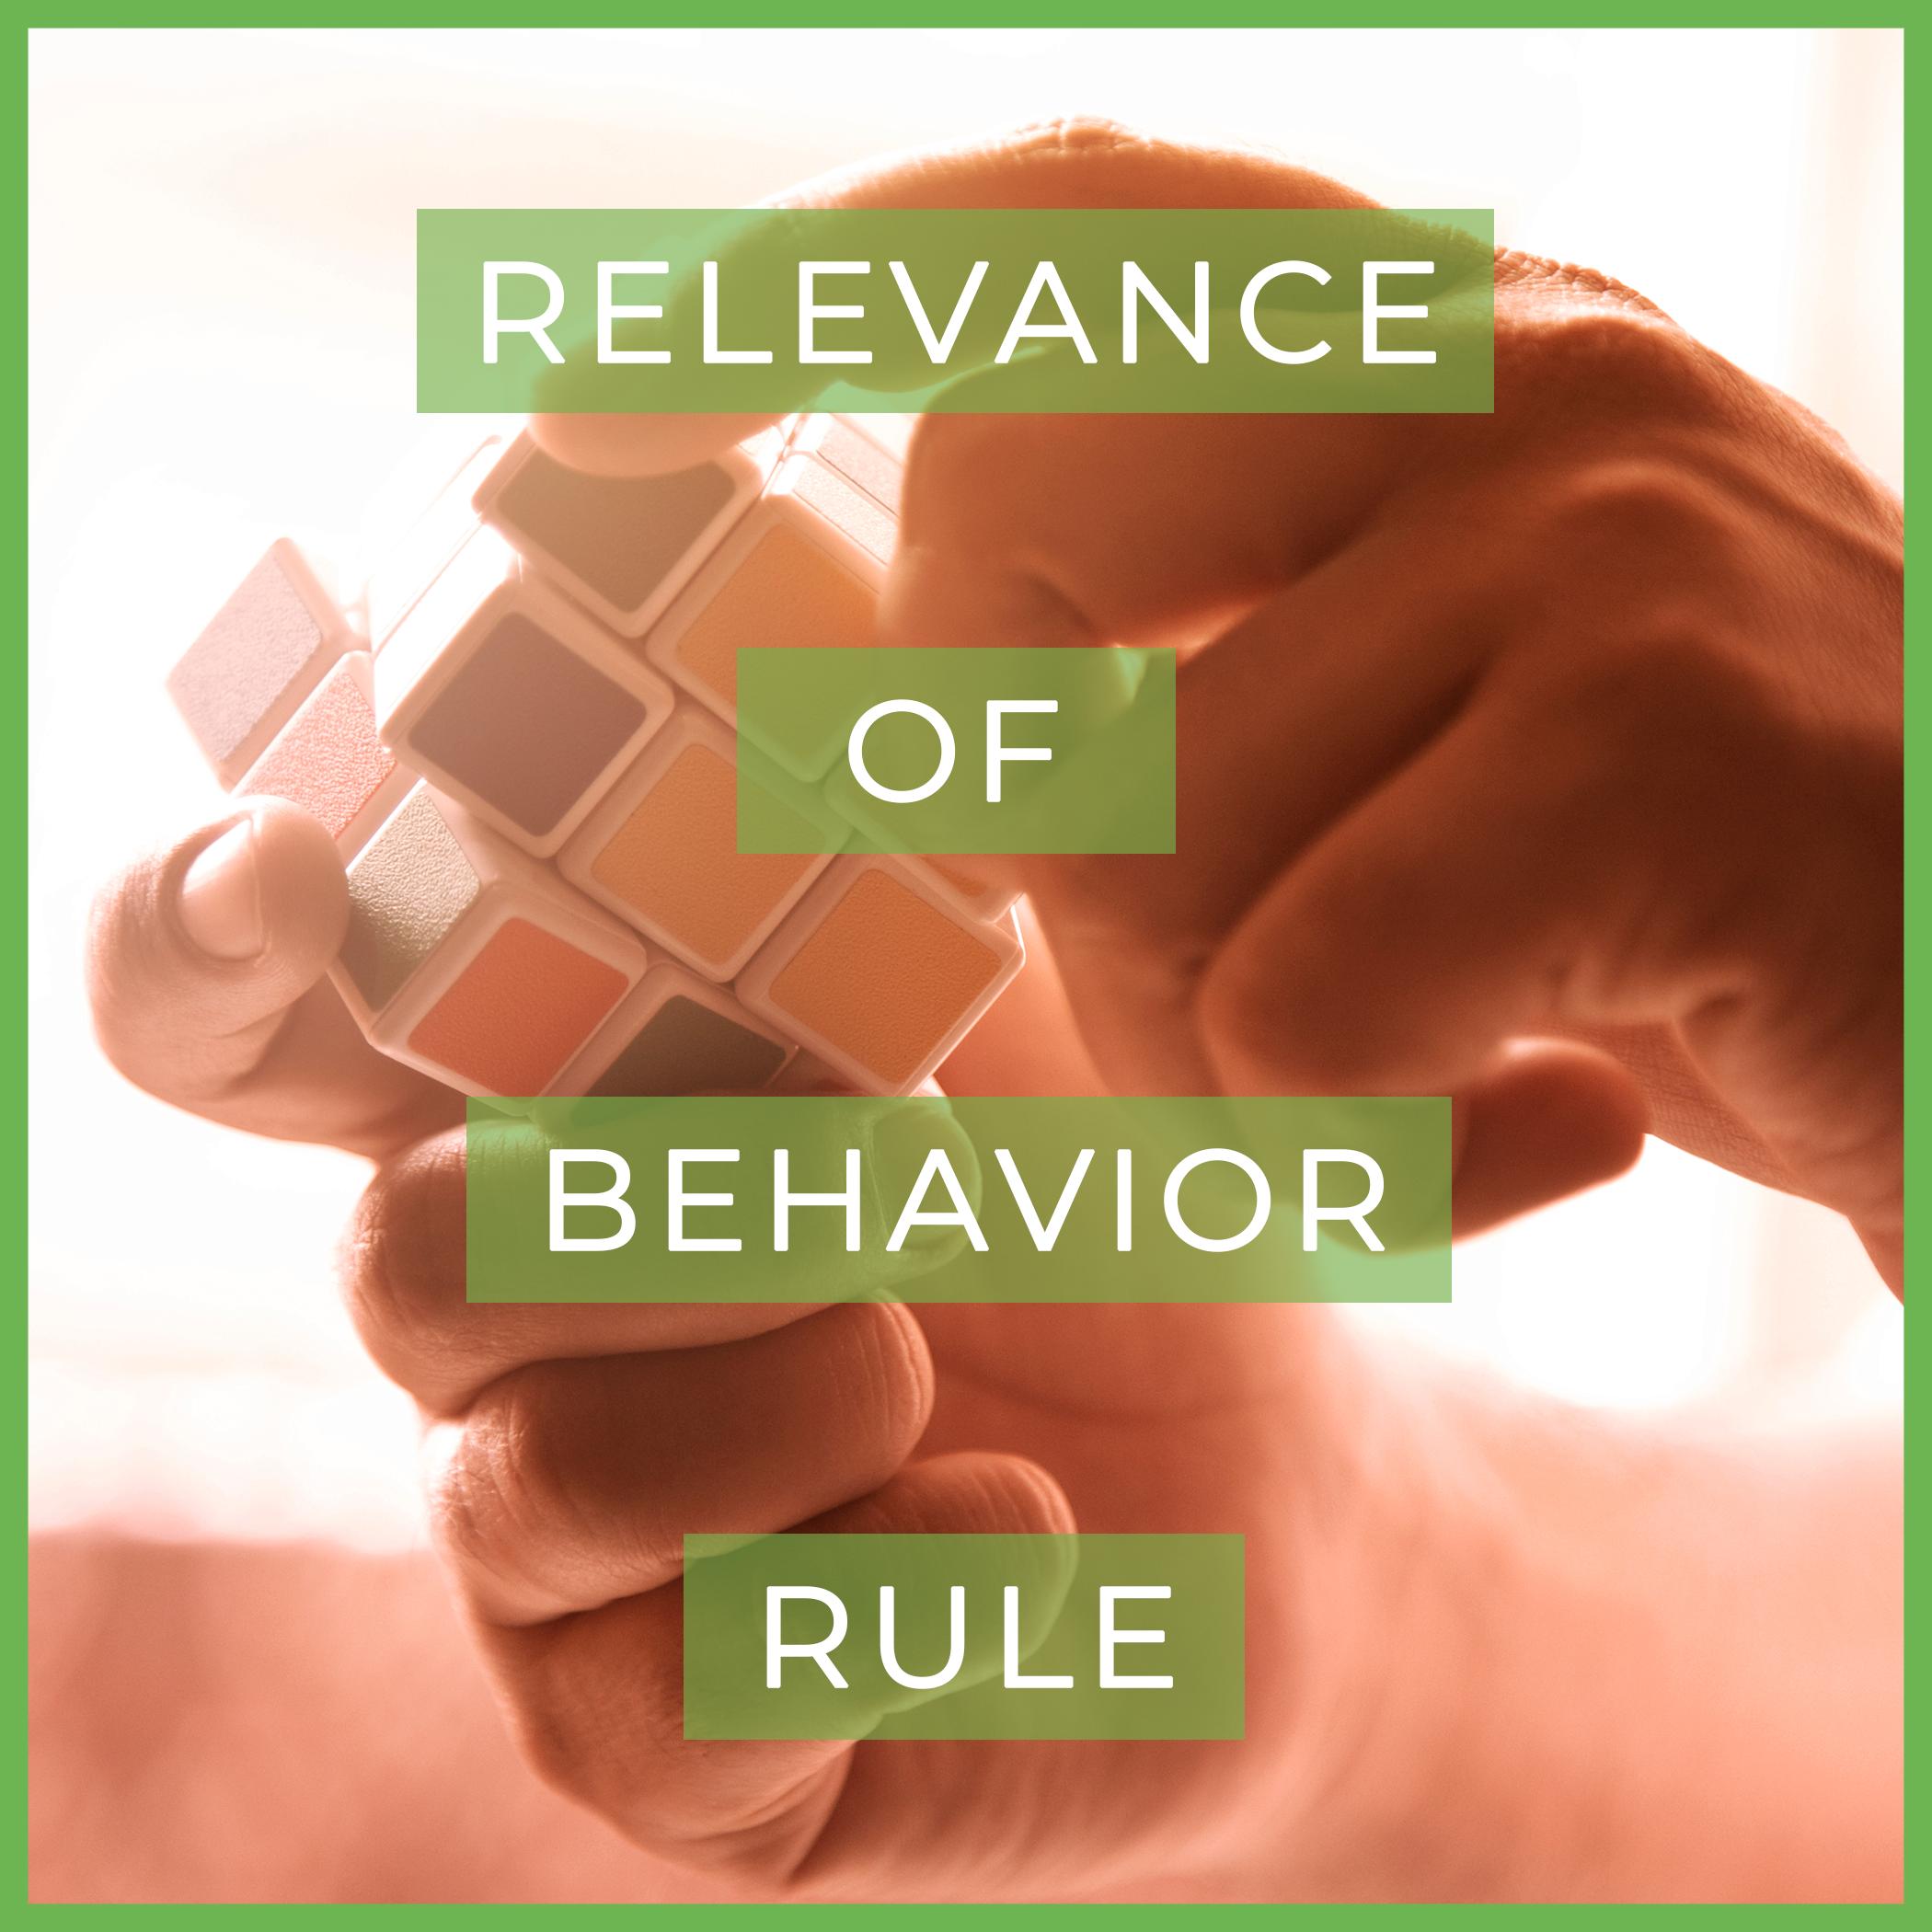 relevance of behavior rule.png